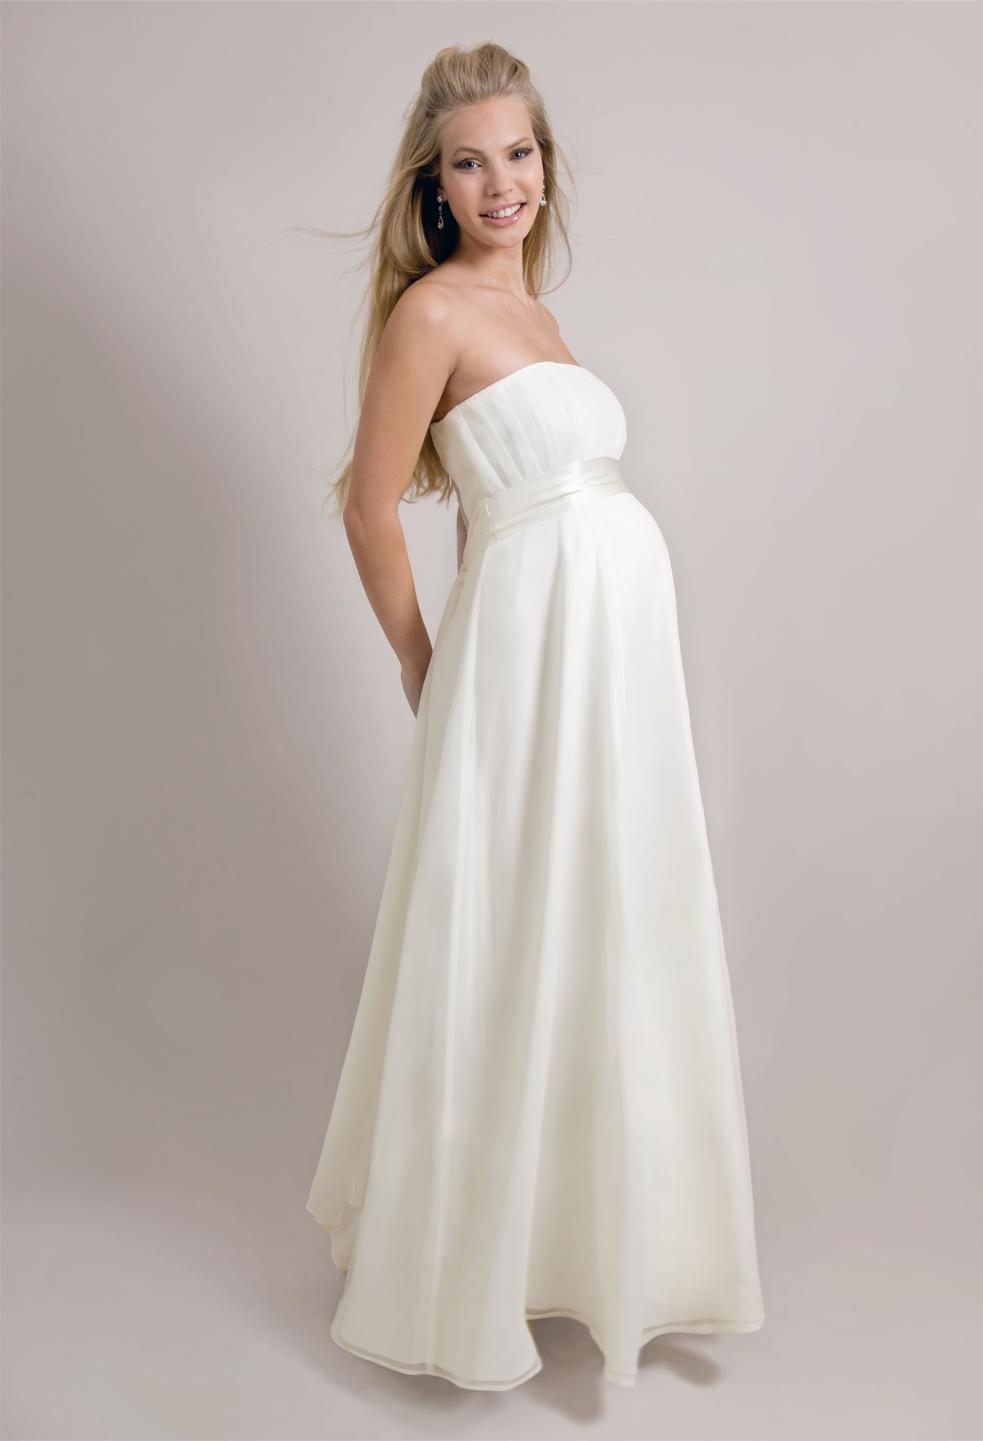 601469be190 Tanya s blog  dillards registry wedding